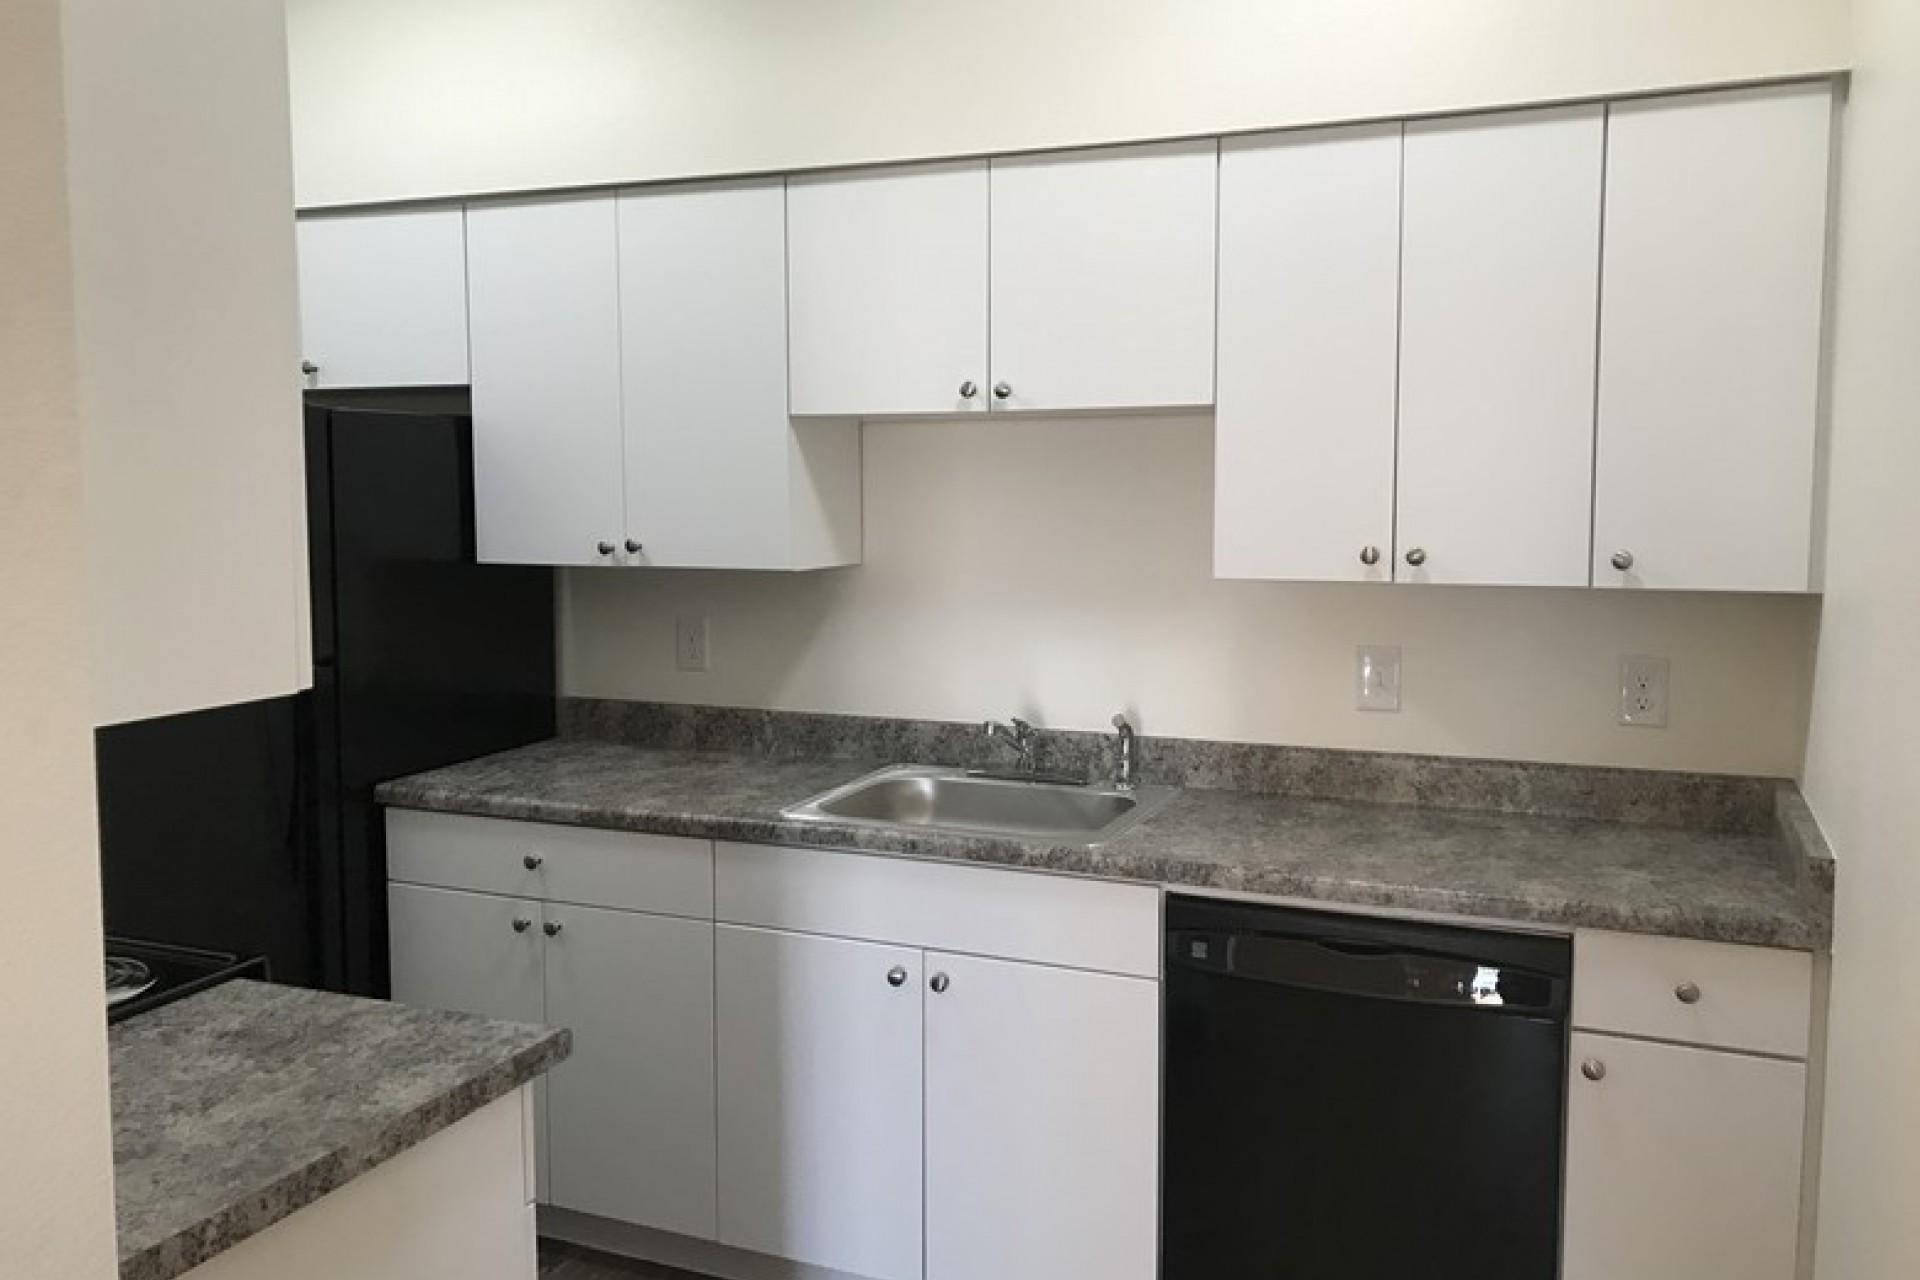 1 2 3 Bedroom Apartment Floor Plans Alta Vista Village